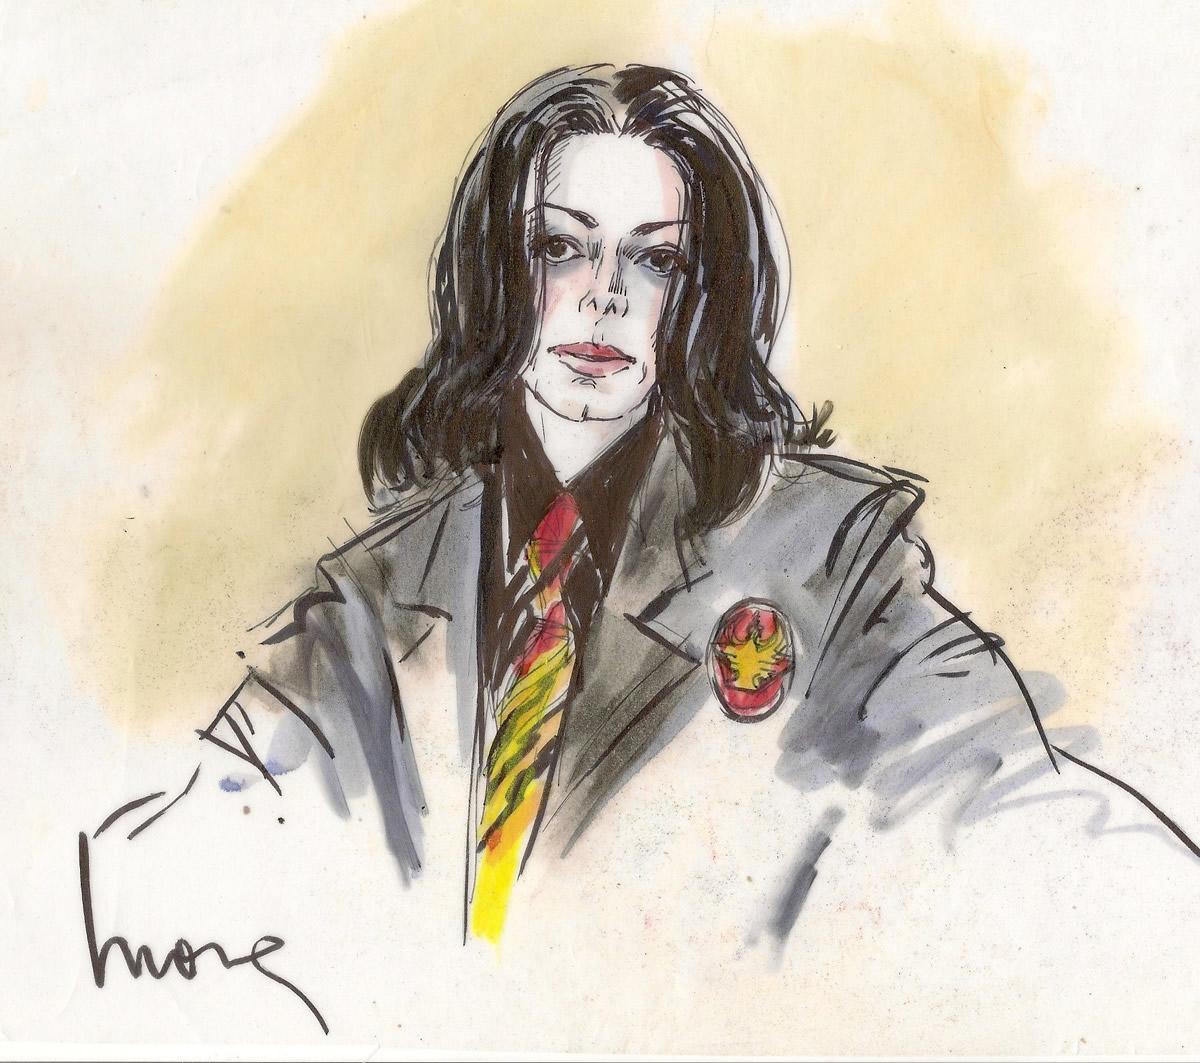 Michael Jackson Child Molestation Courtroom Illustration